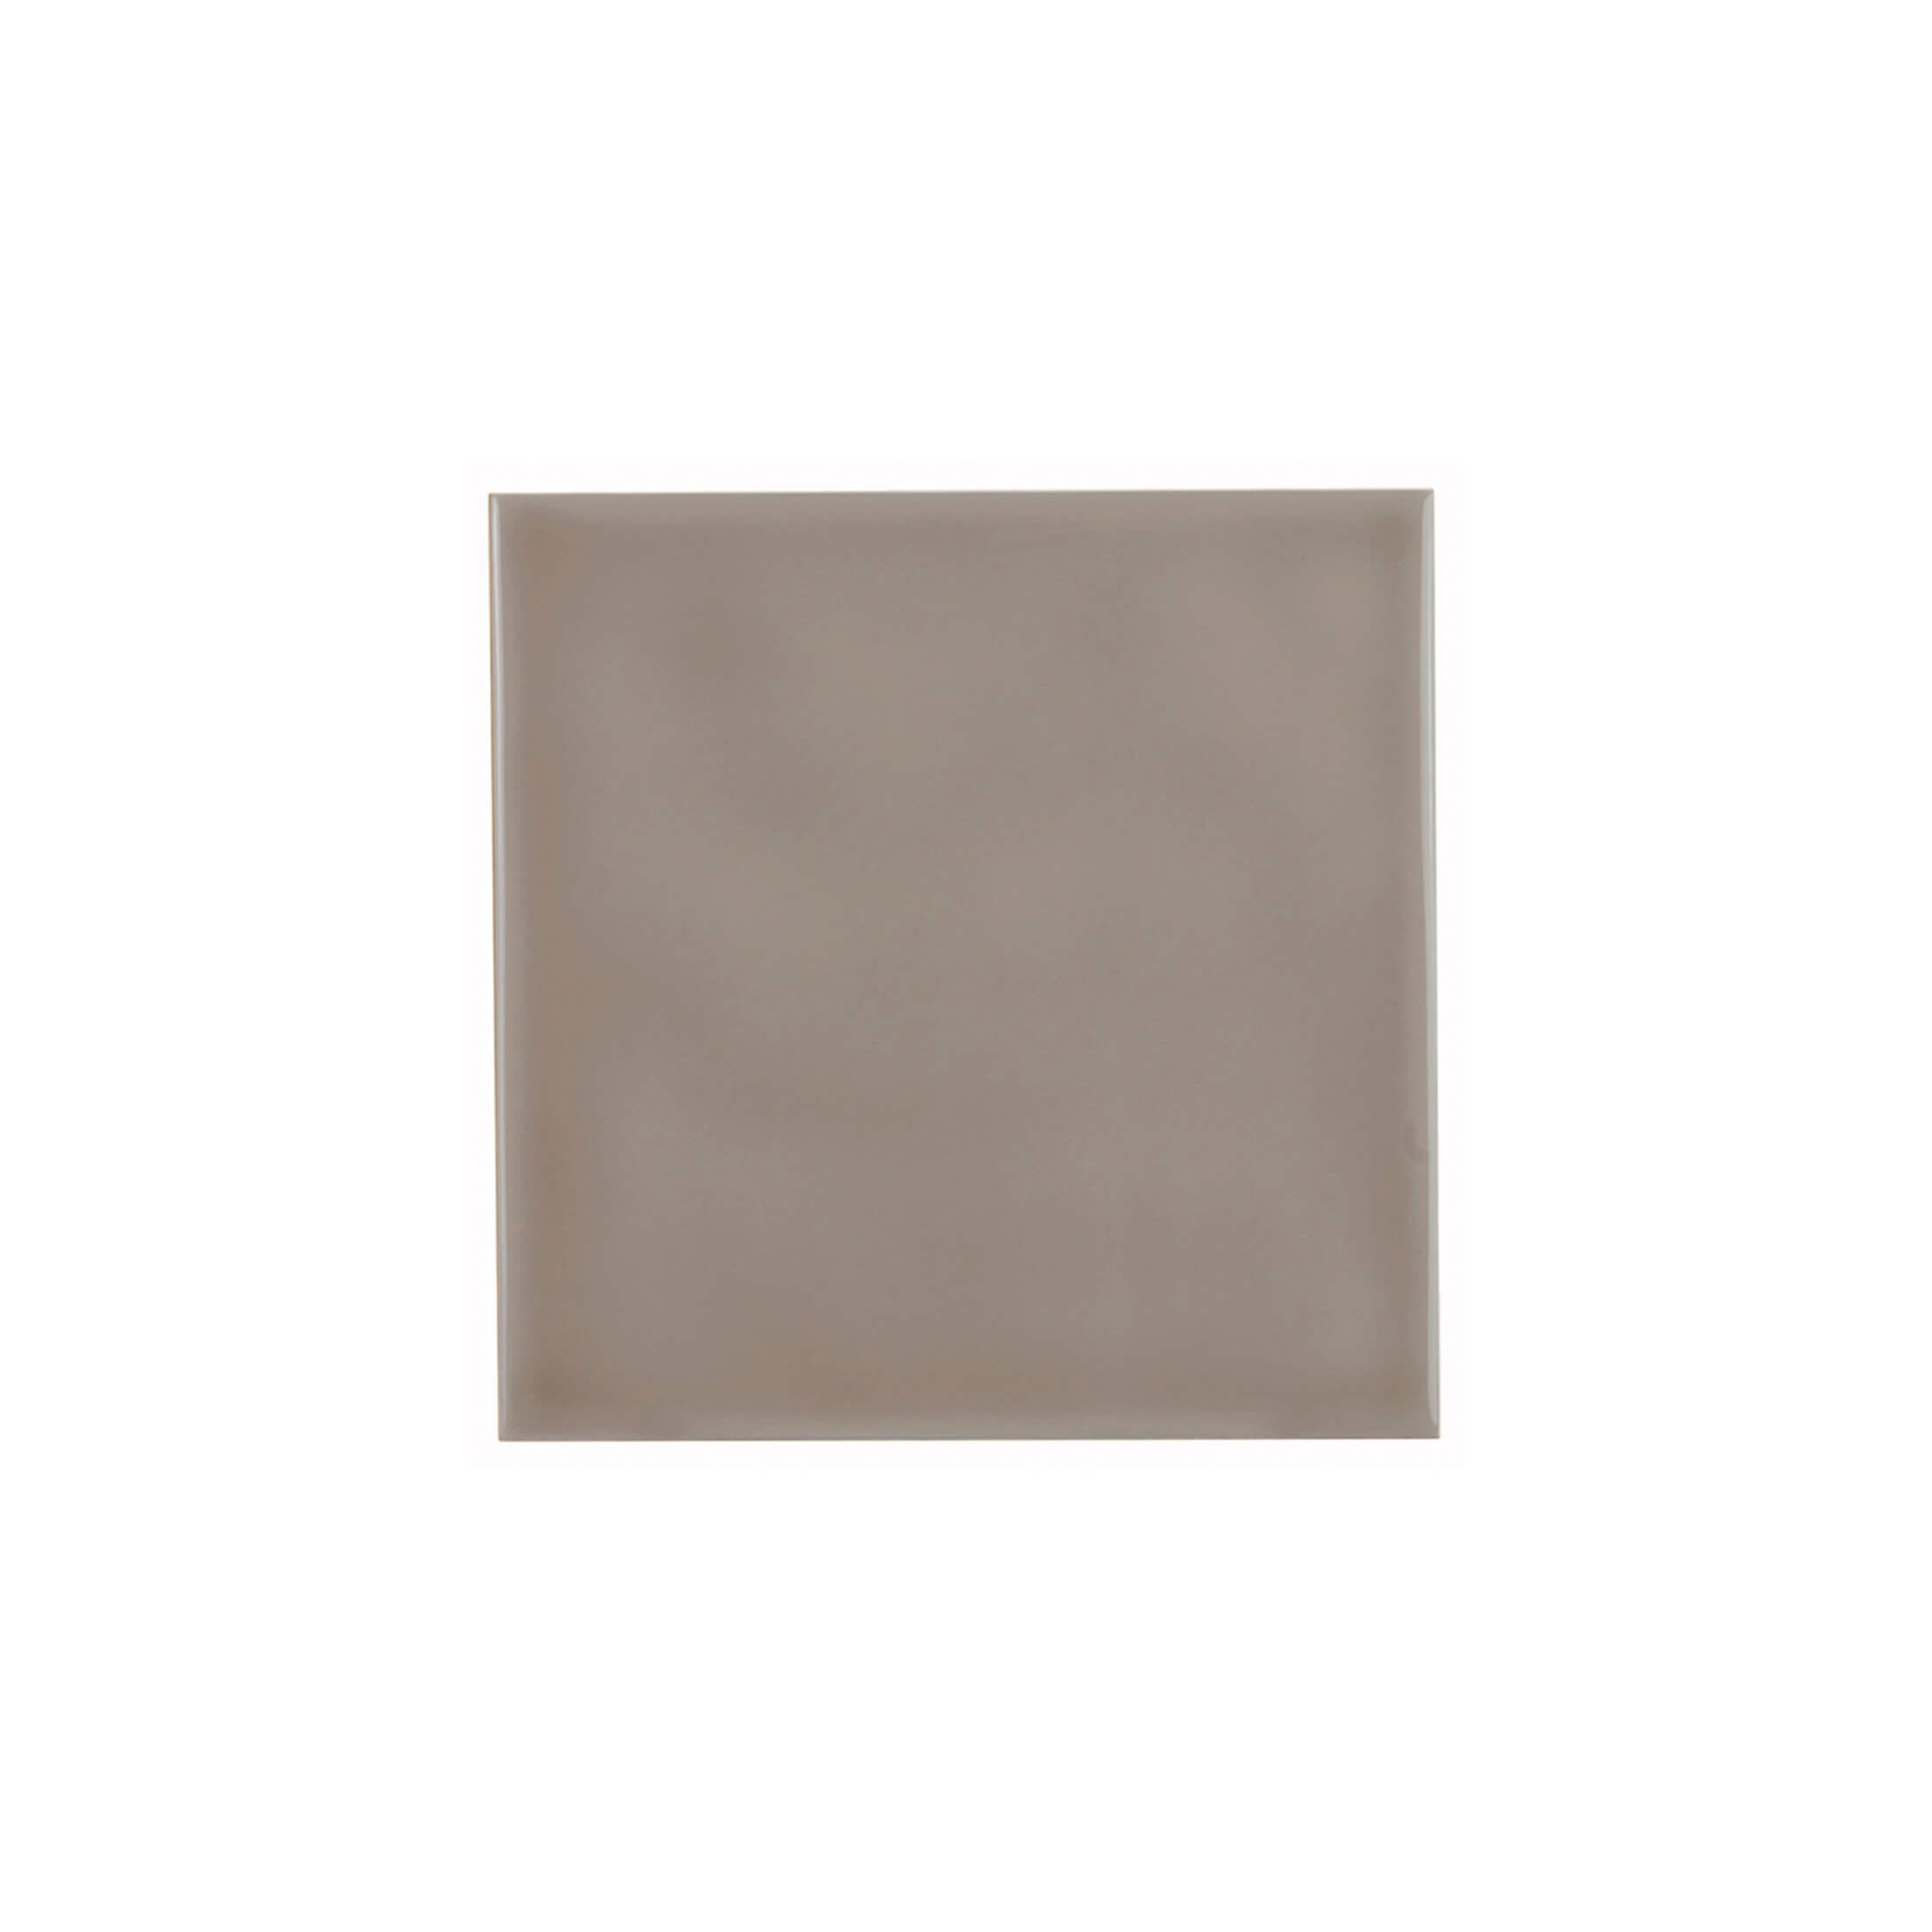 ADST1003 - LISO  - 14.8 cm X 14.8 cm